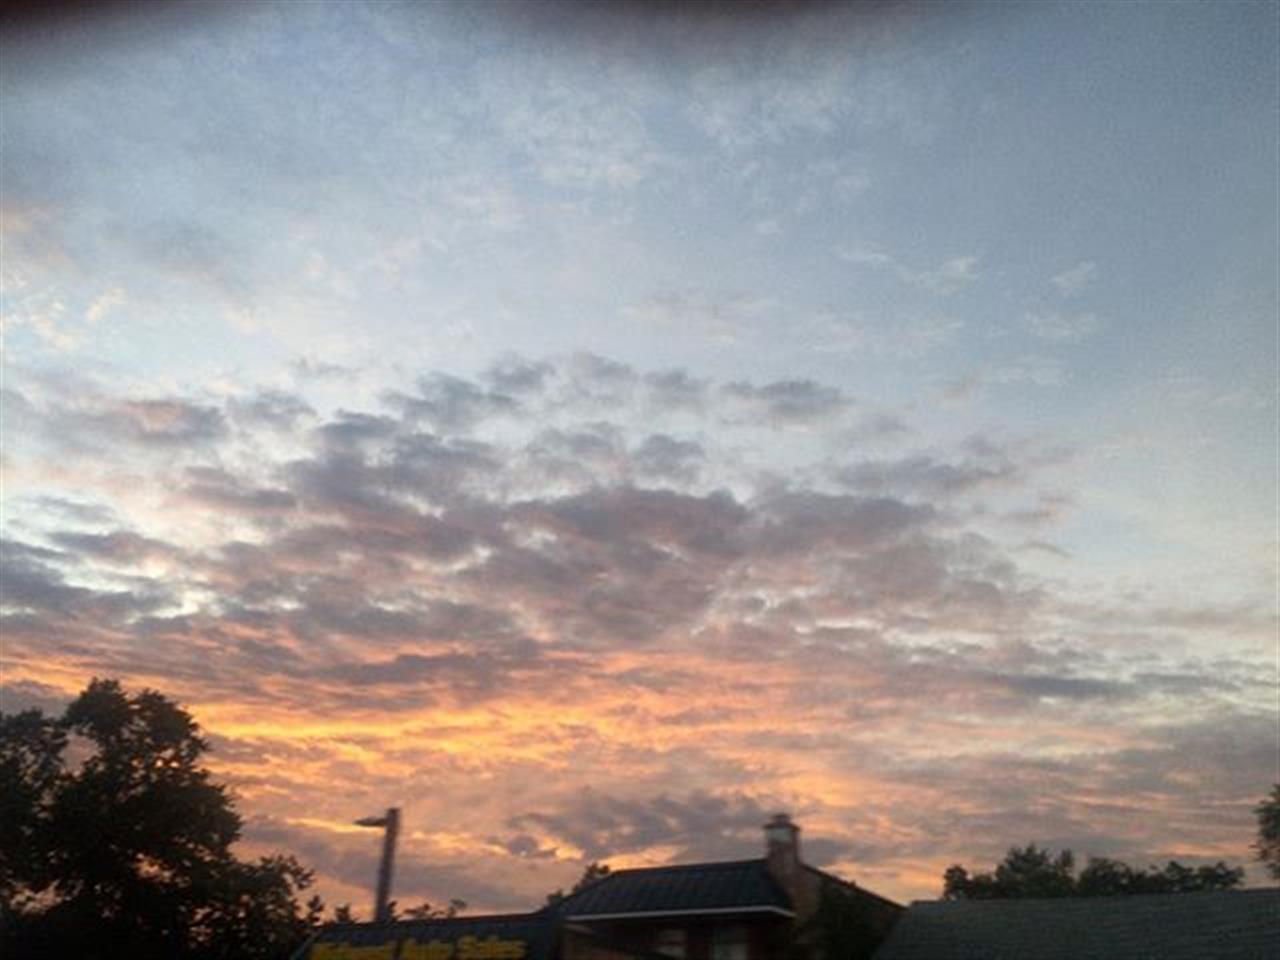 #orlandpark #sunset #chicagoneighborhood #leadingrelocal #bairdwarner